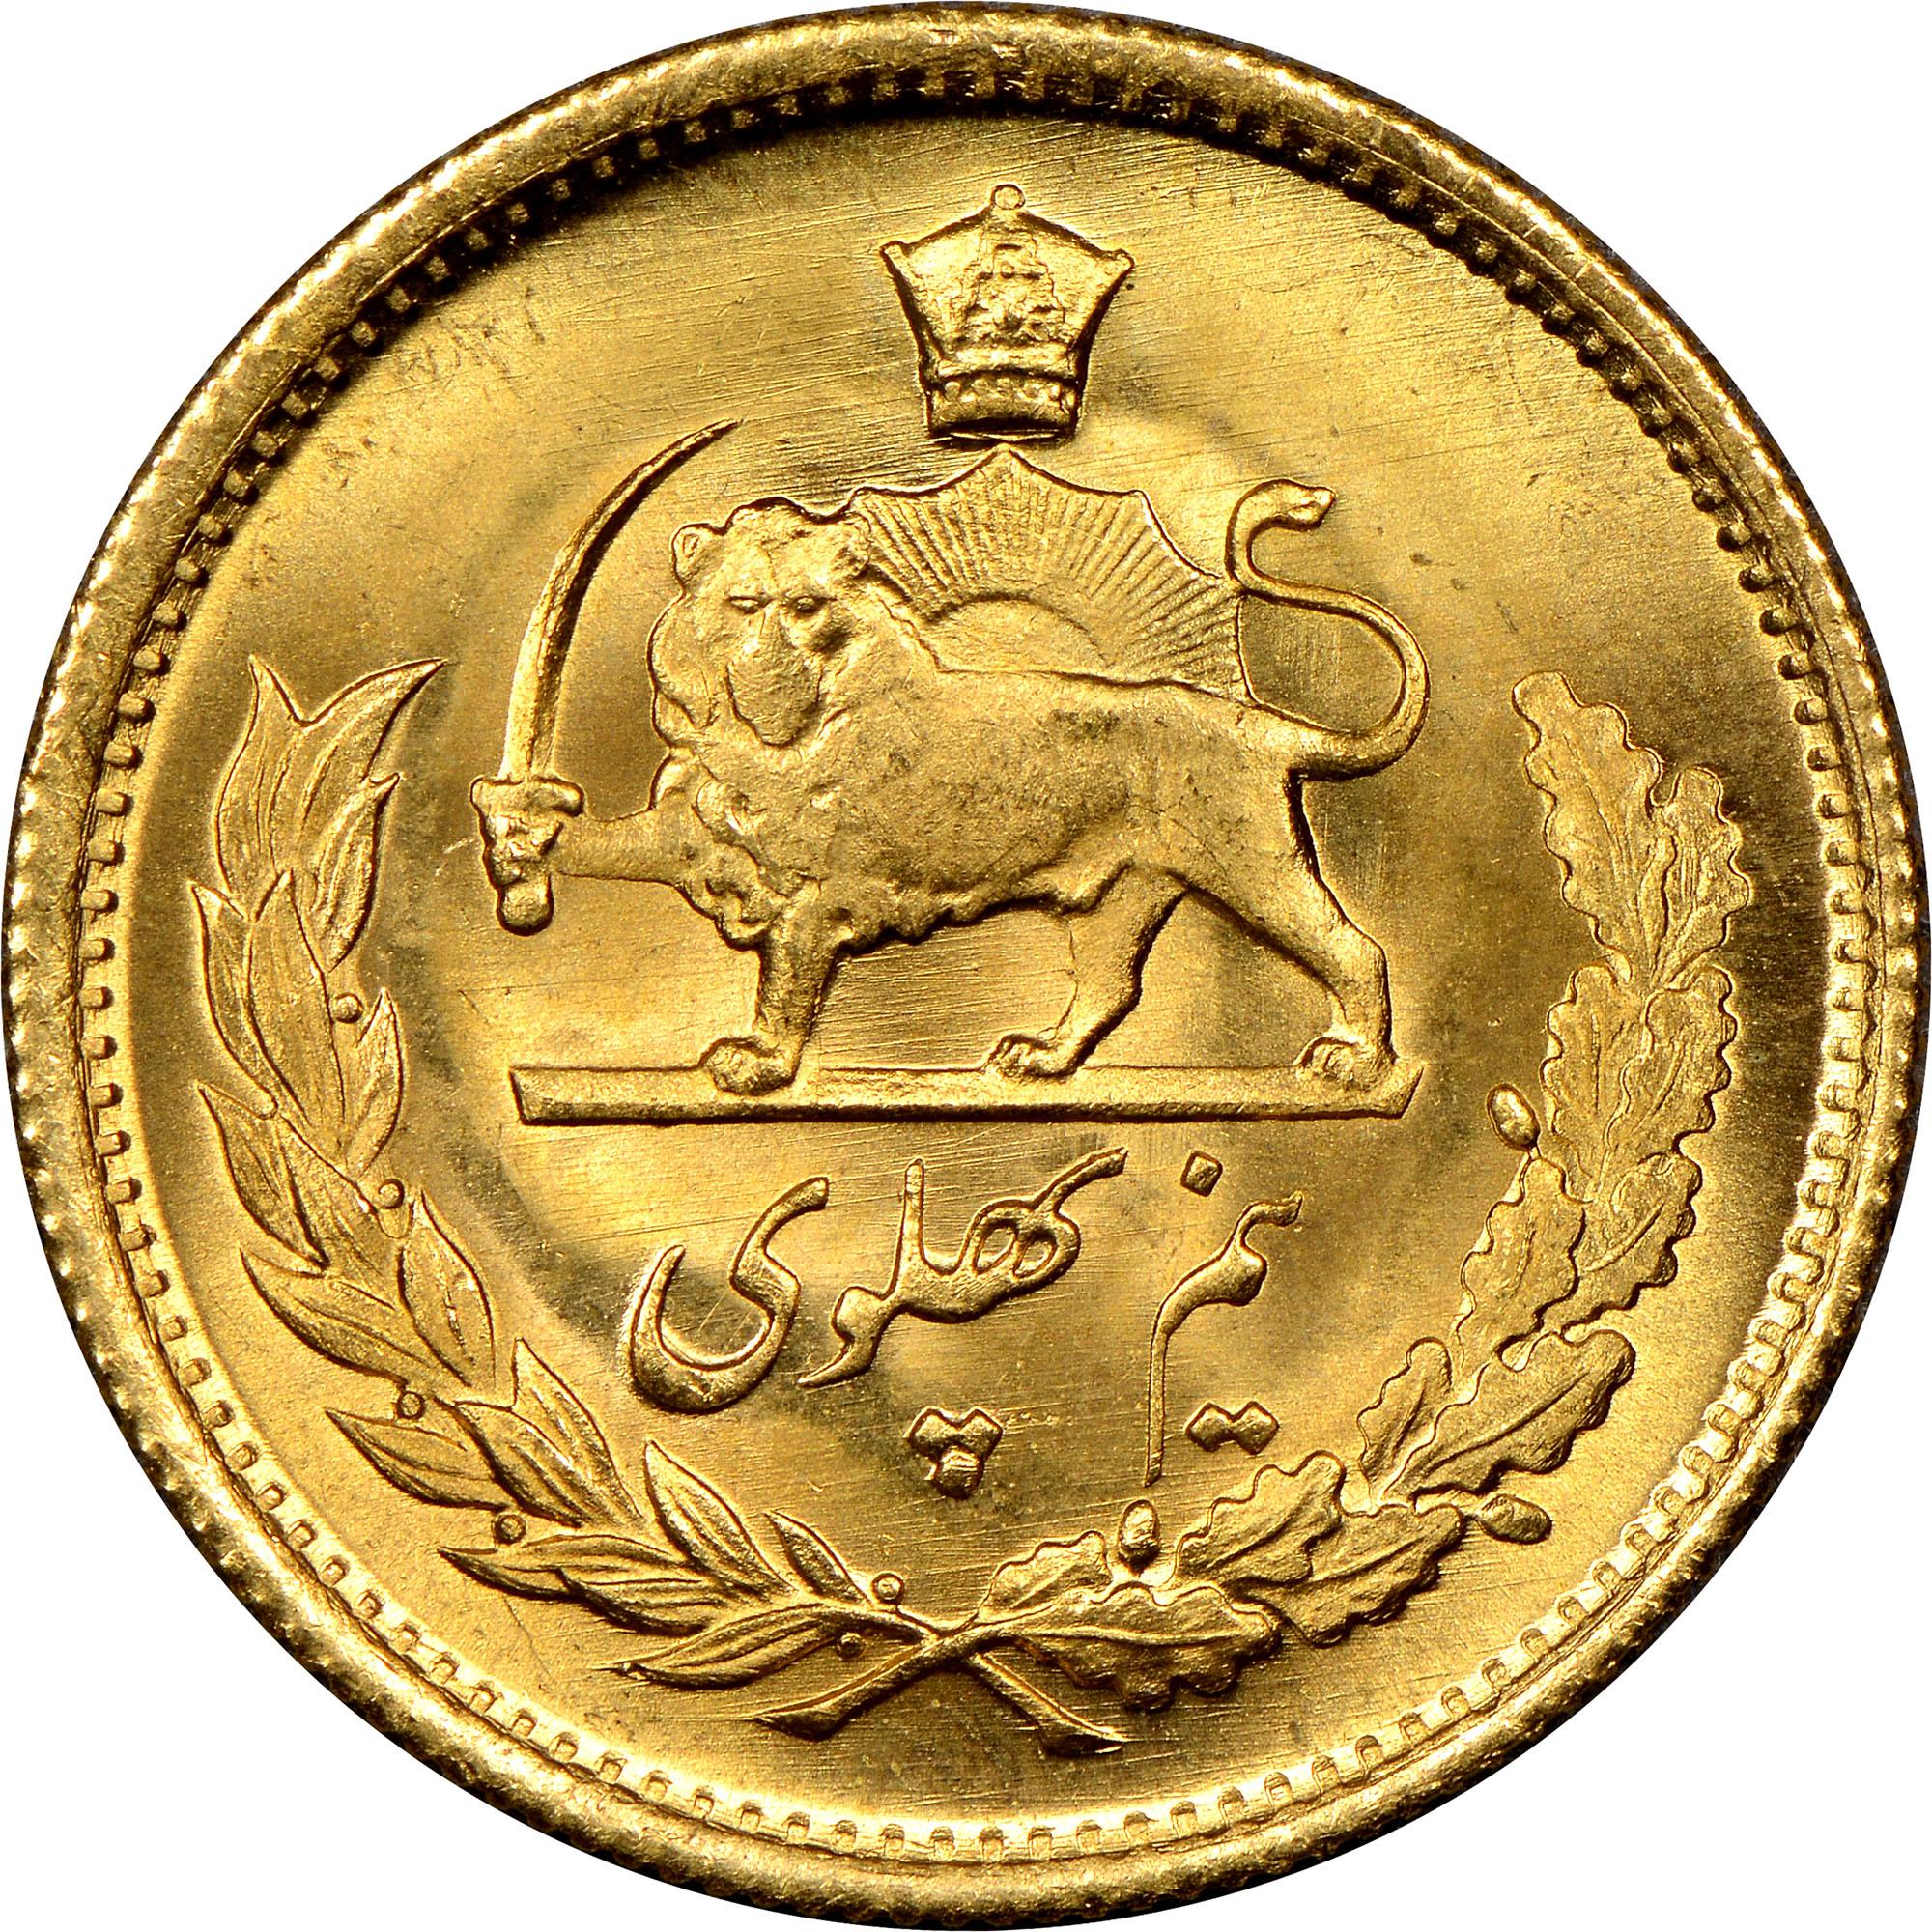 Iran 1 2 Pahlavi Km 1199 Prices Amp Values Ngc